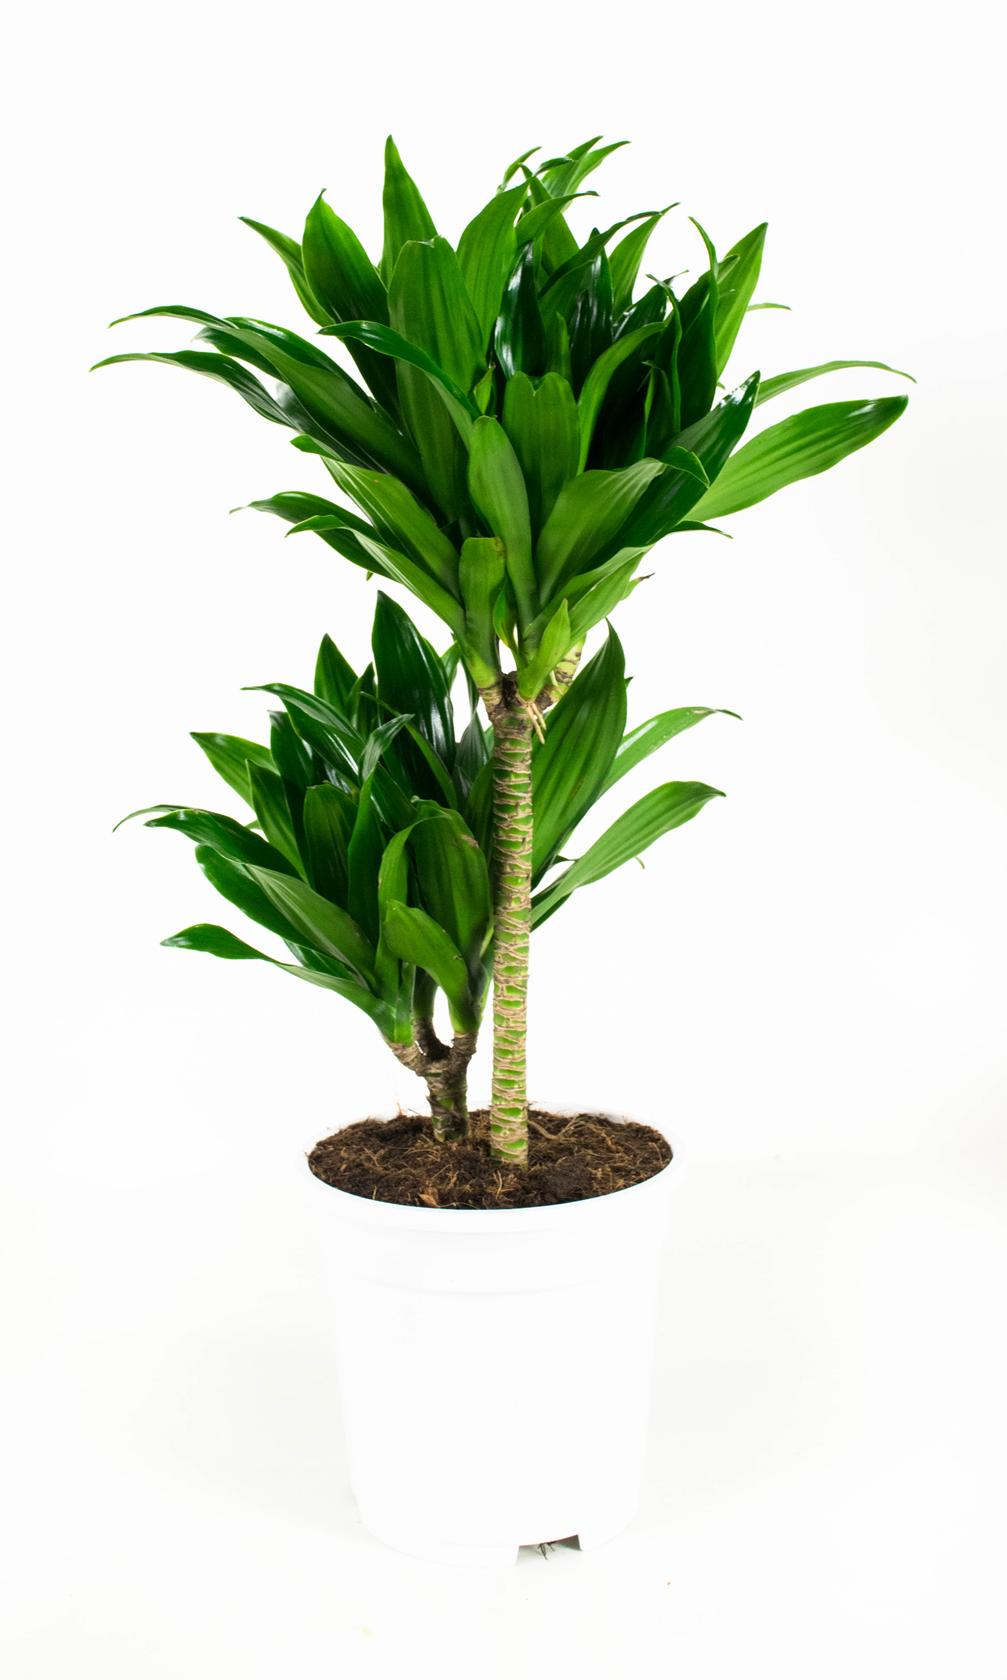 2 stuks Drakenbloedboom - Dracaena fragans compacta 65cm hoog